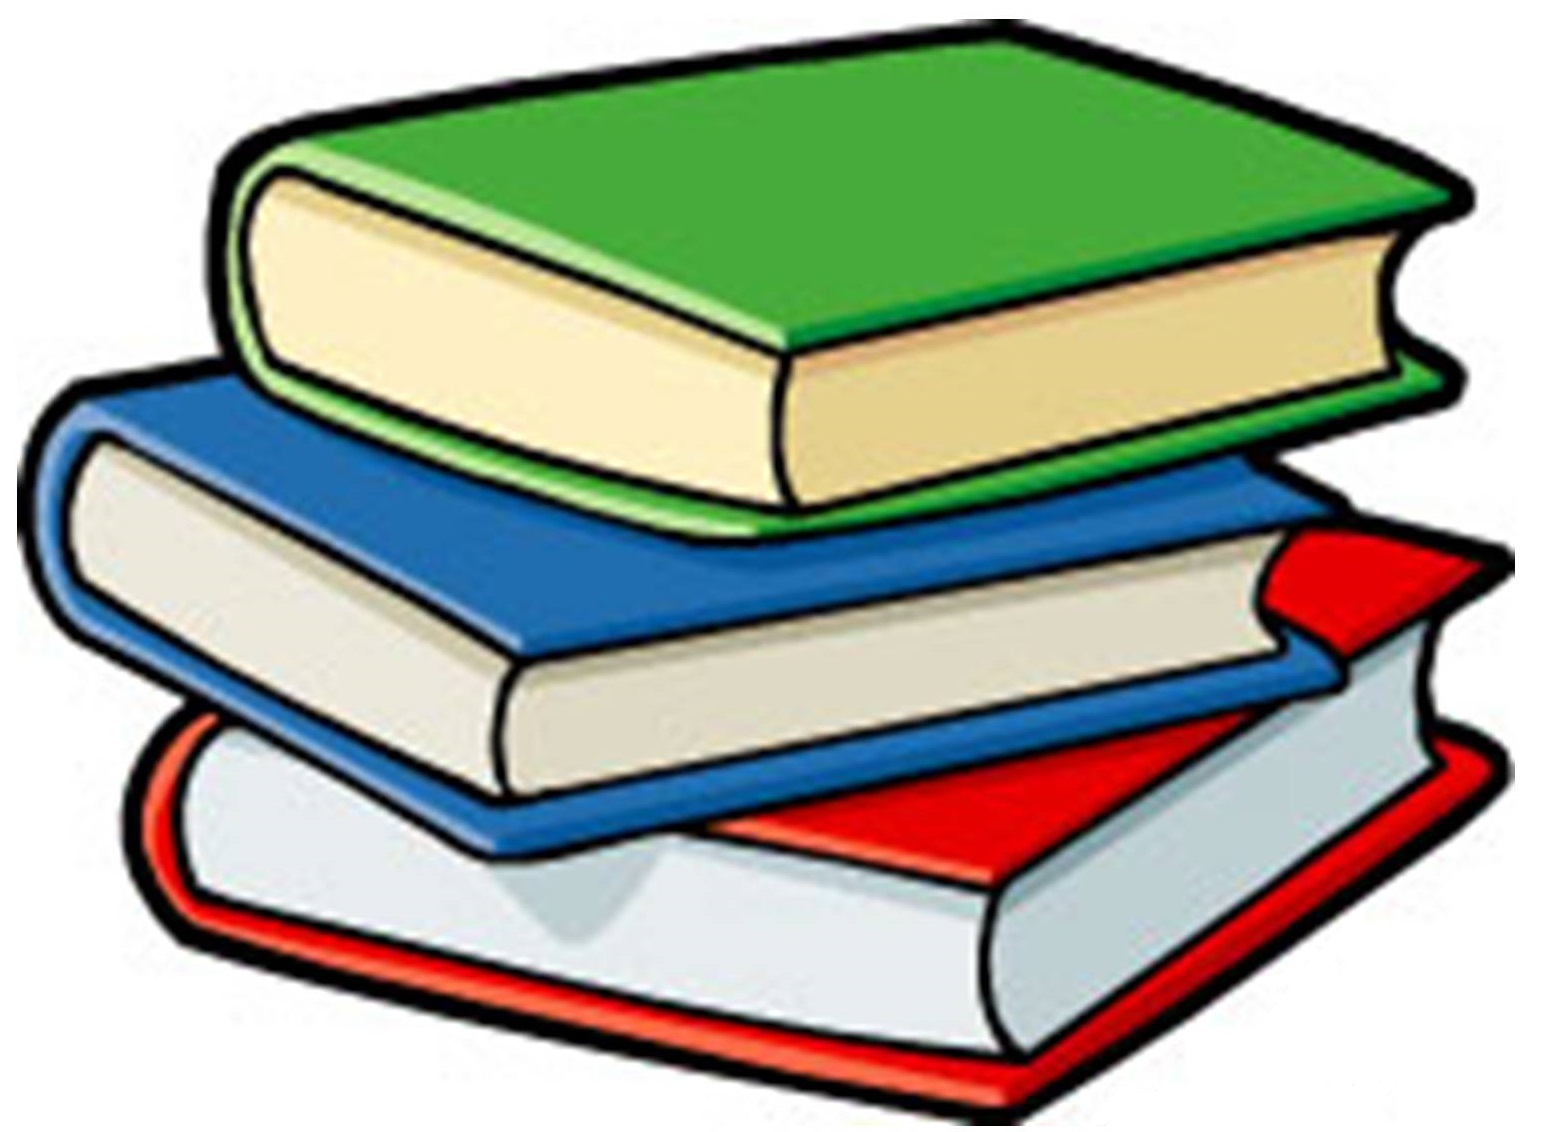 English book clipart